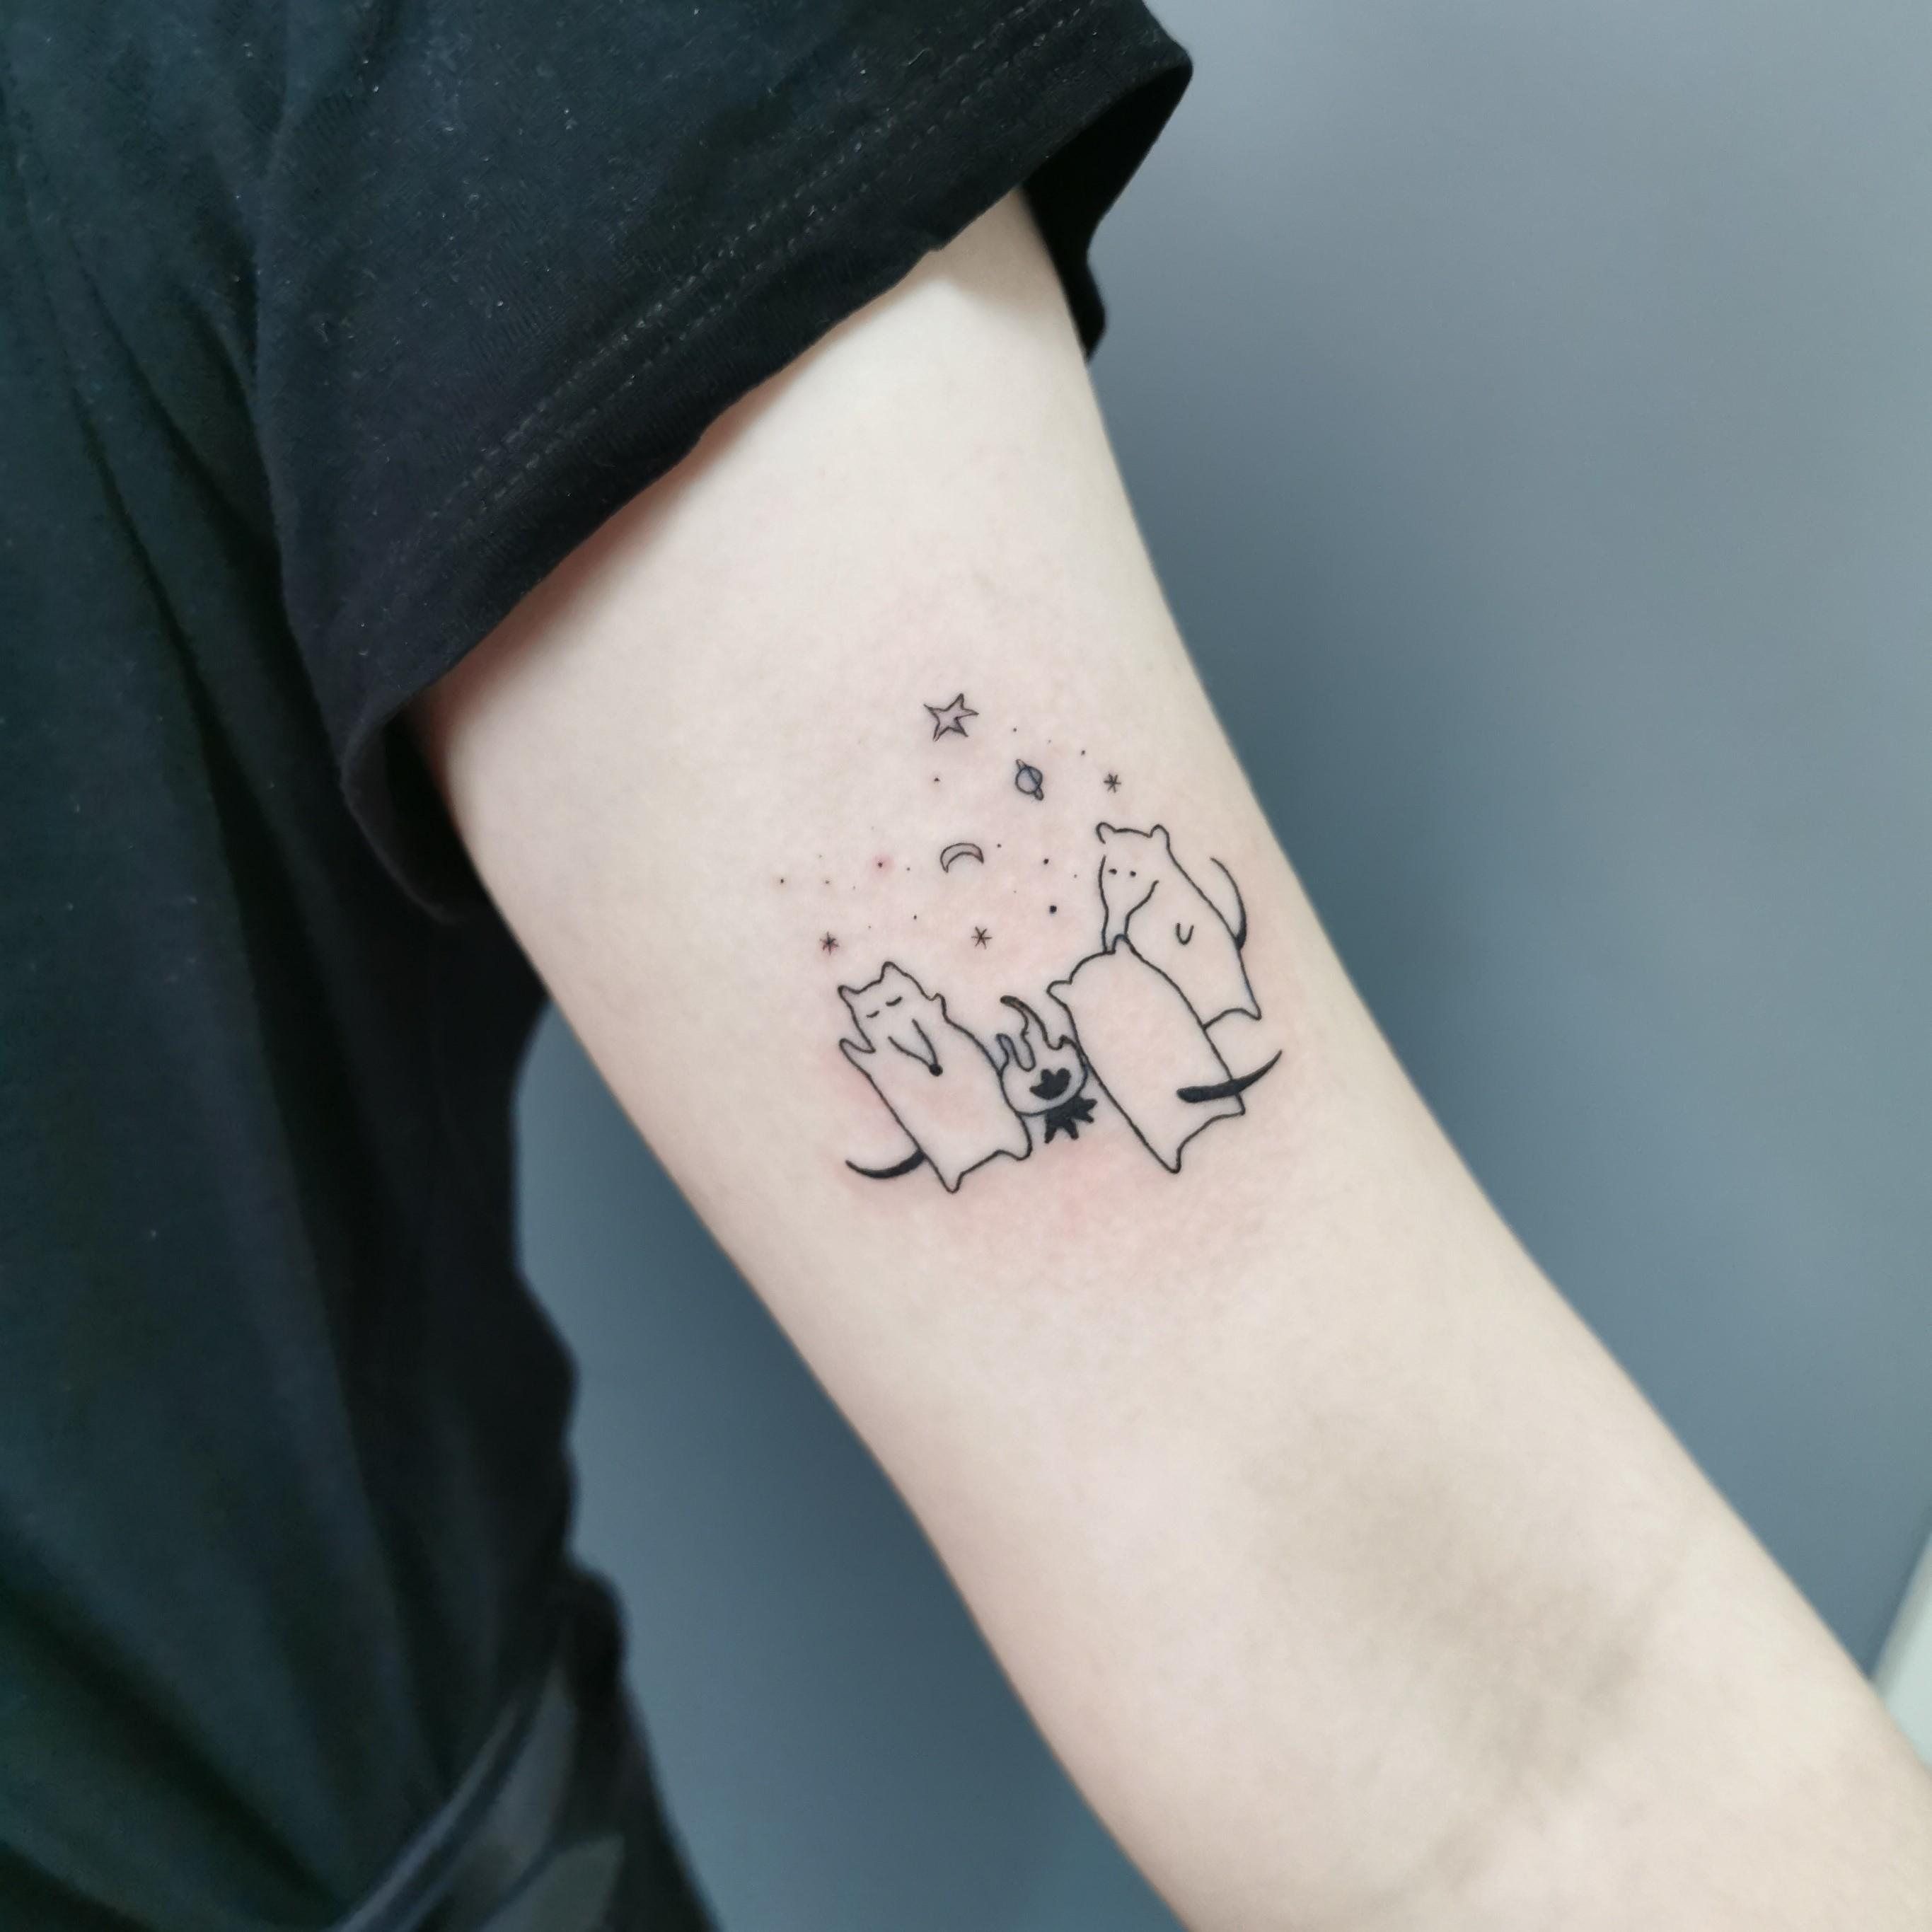 Inksearch tattoo Nicoletta.ink